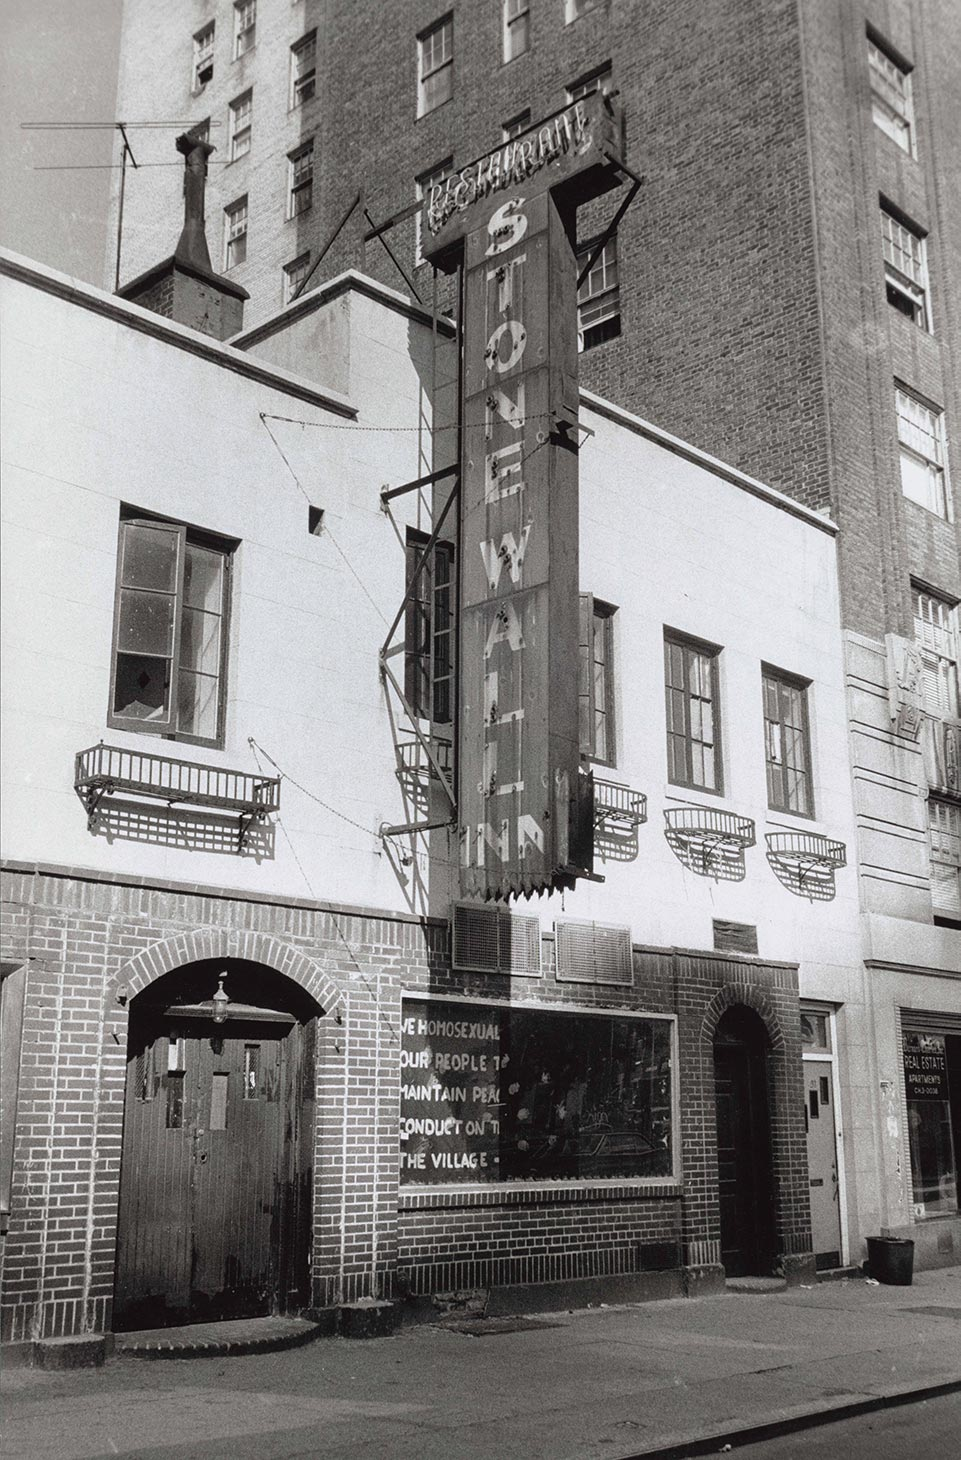 The Stonewall Inn, New York